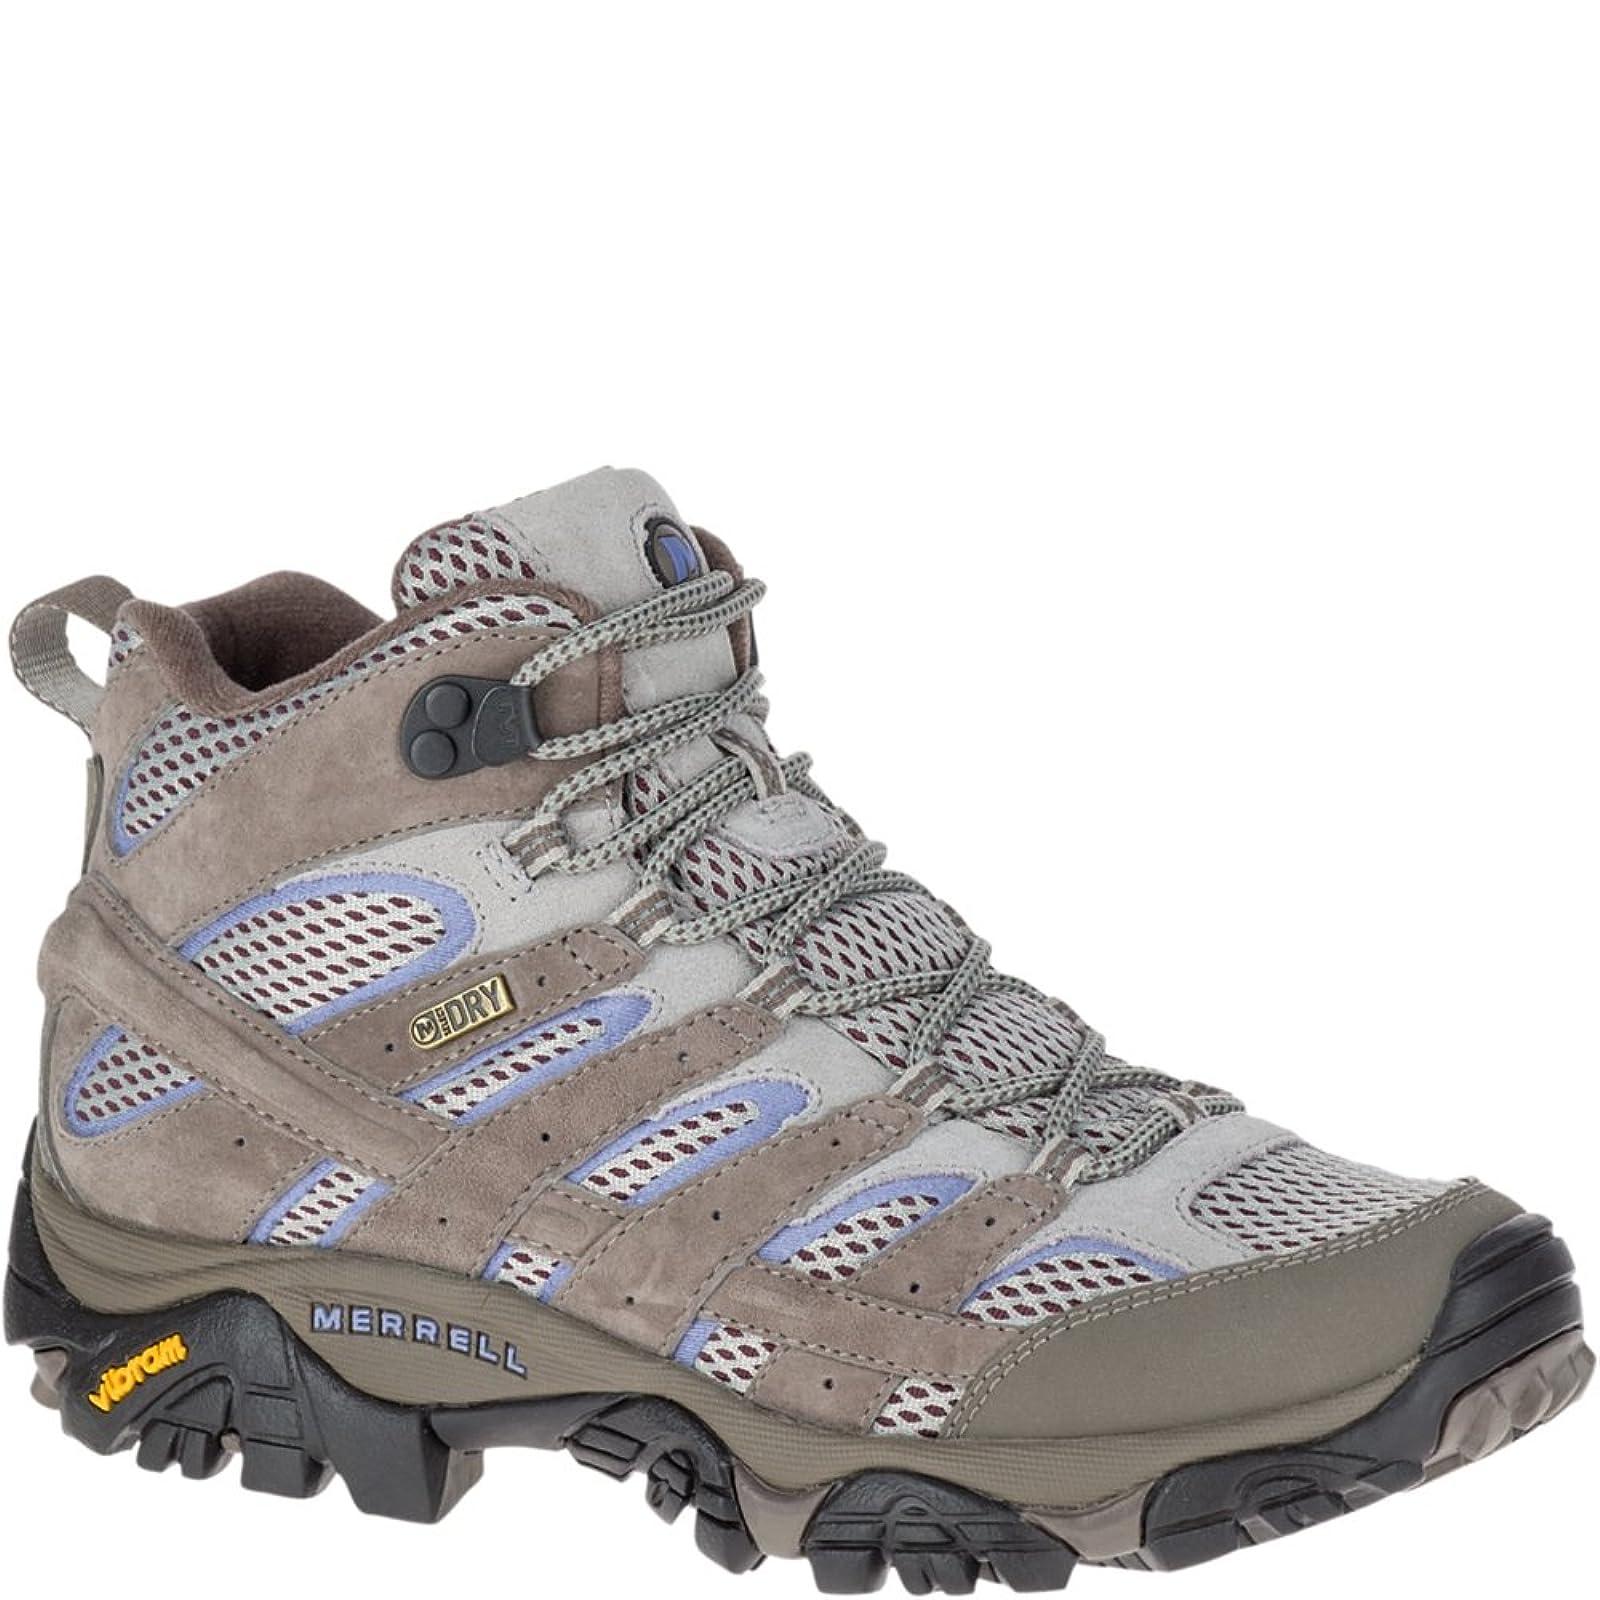 Merrell Women's Moab 2 Mid Waterproof Hiking Boot US - 1